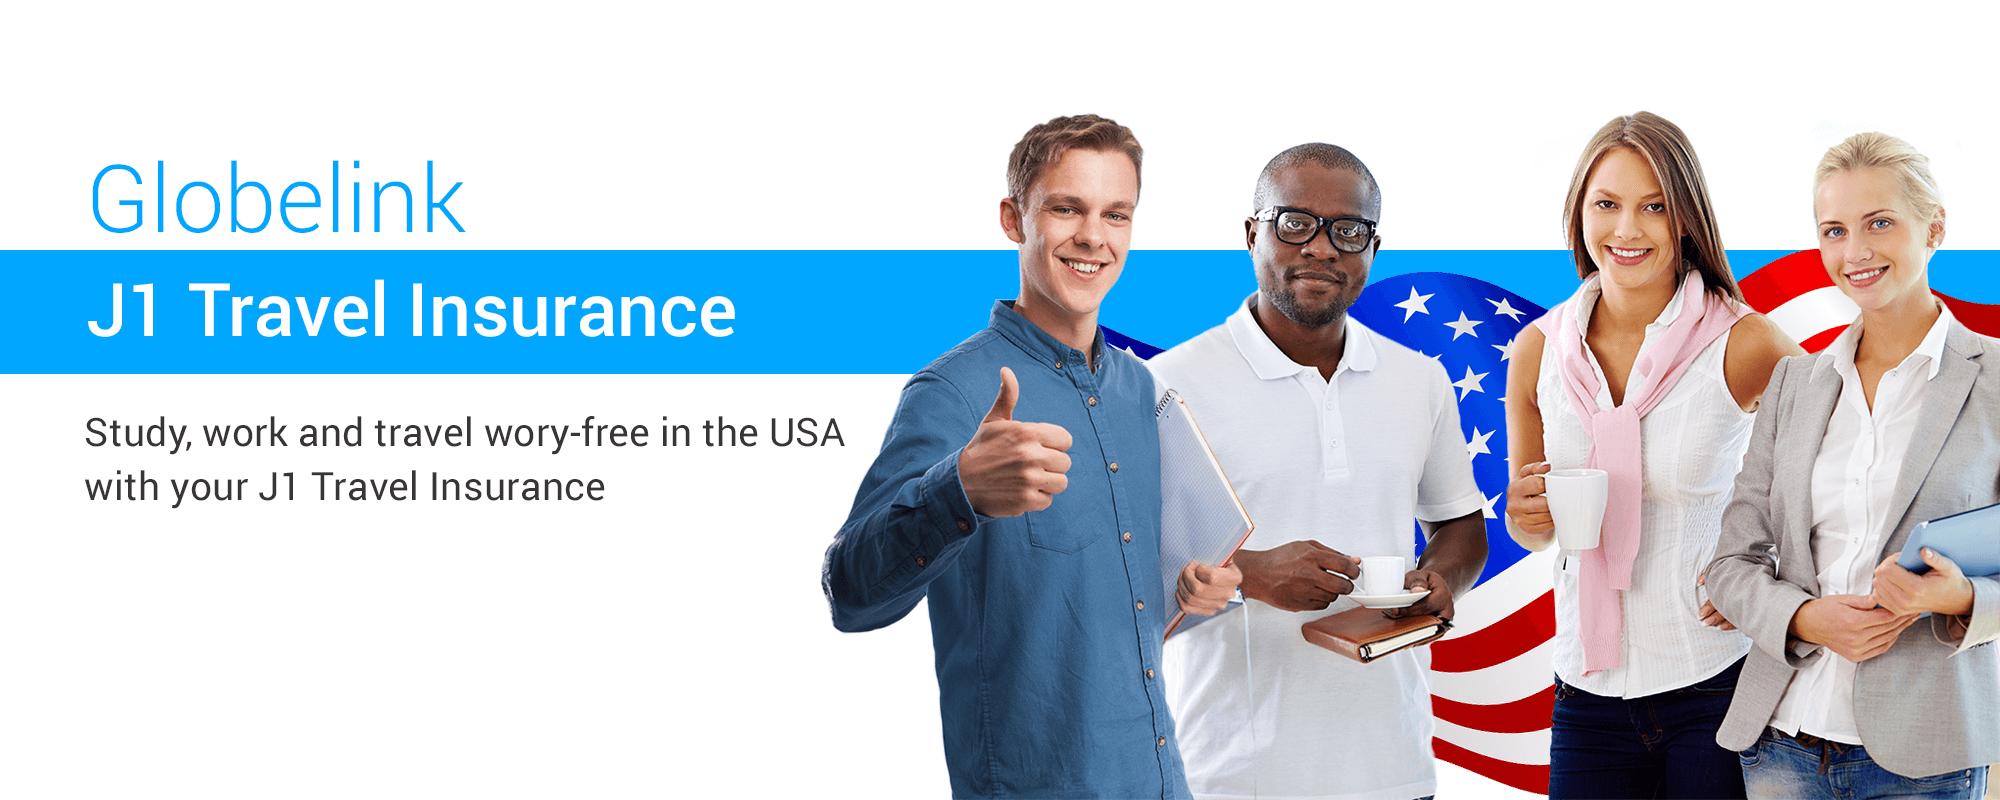 J1 travel insurance